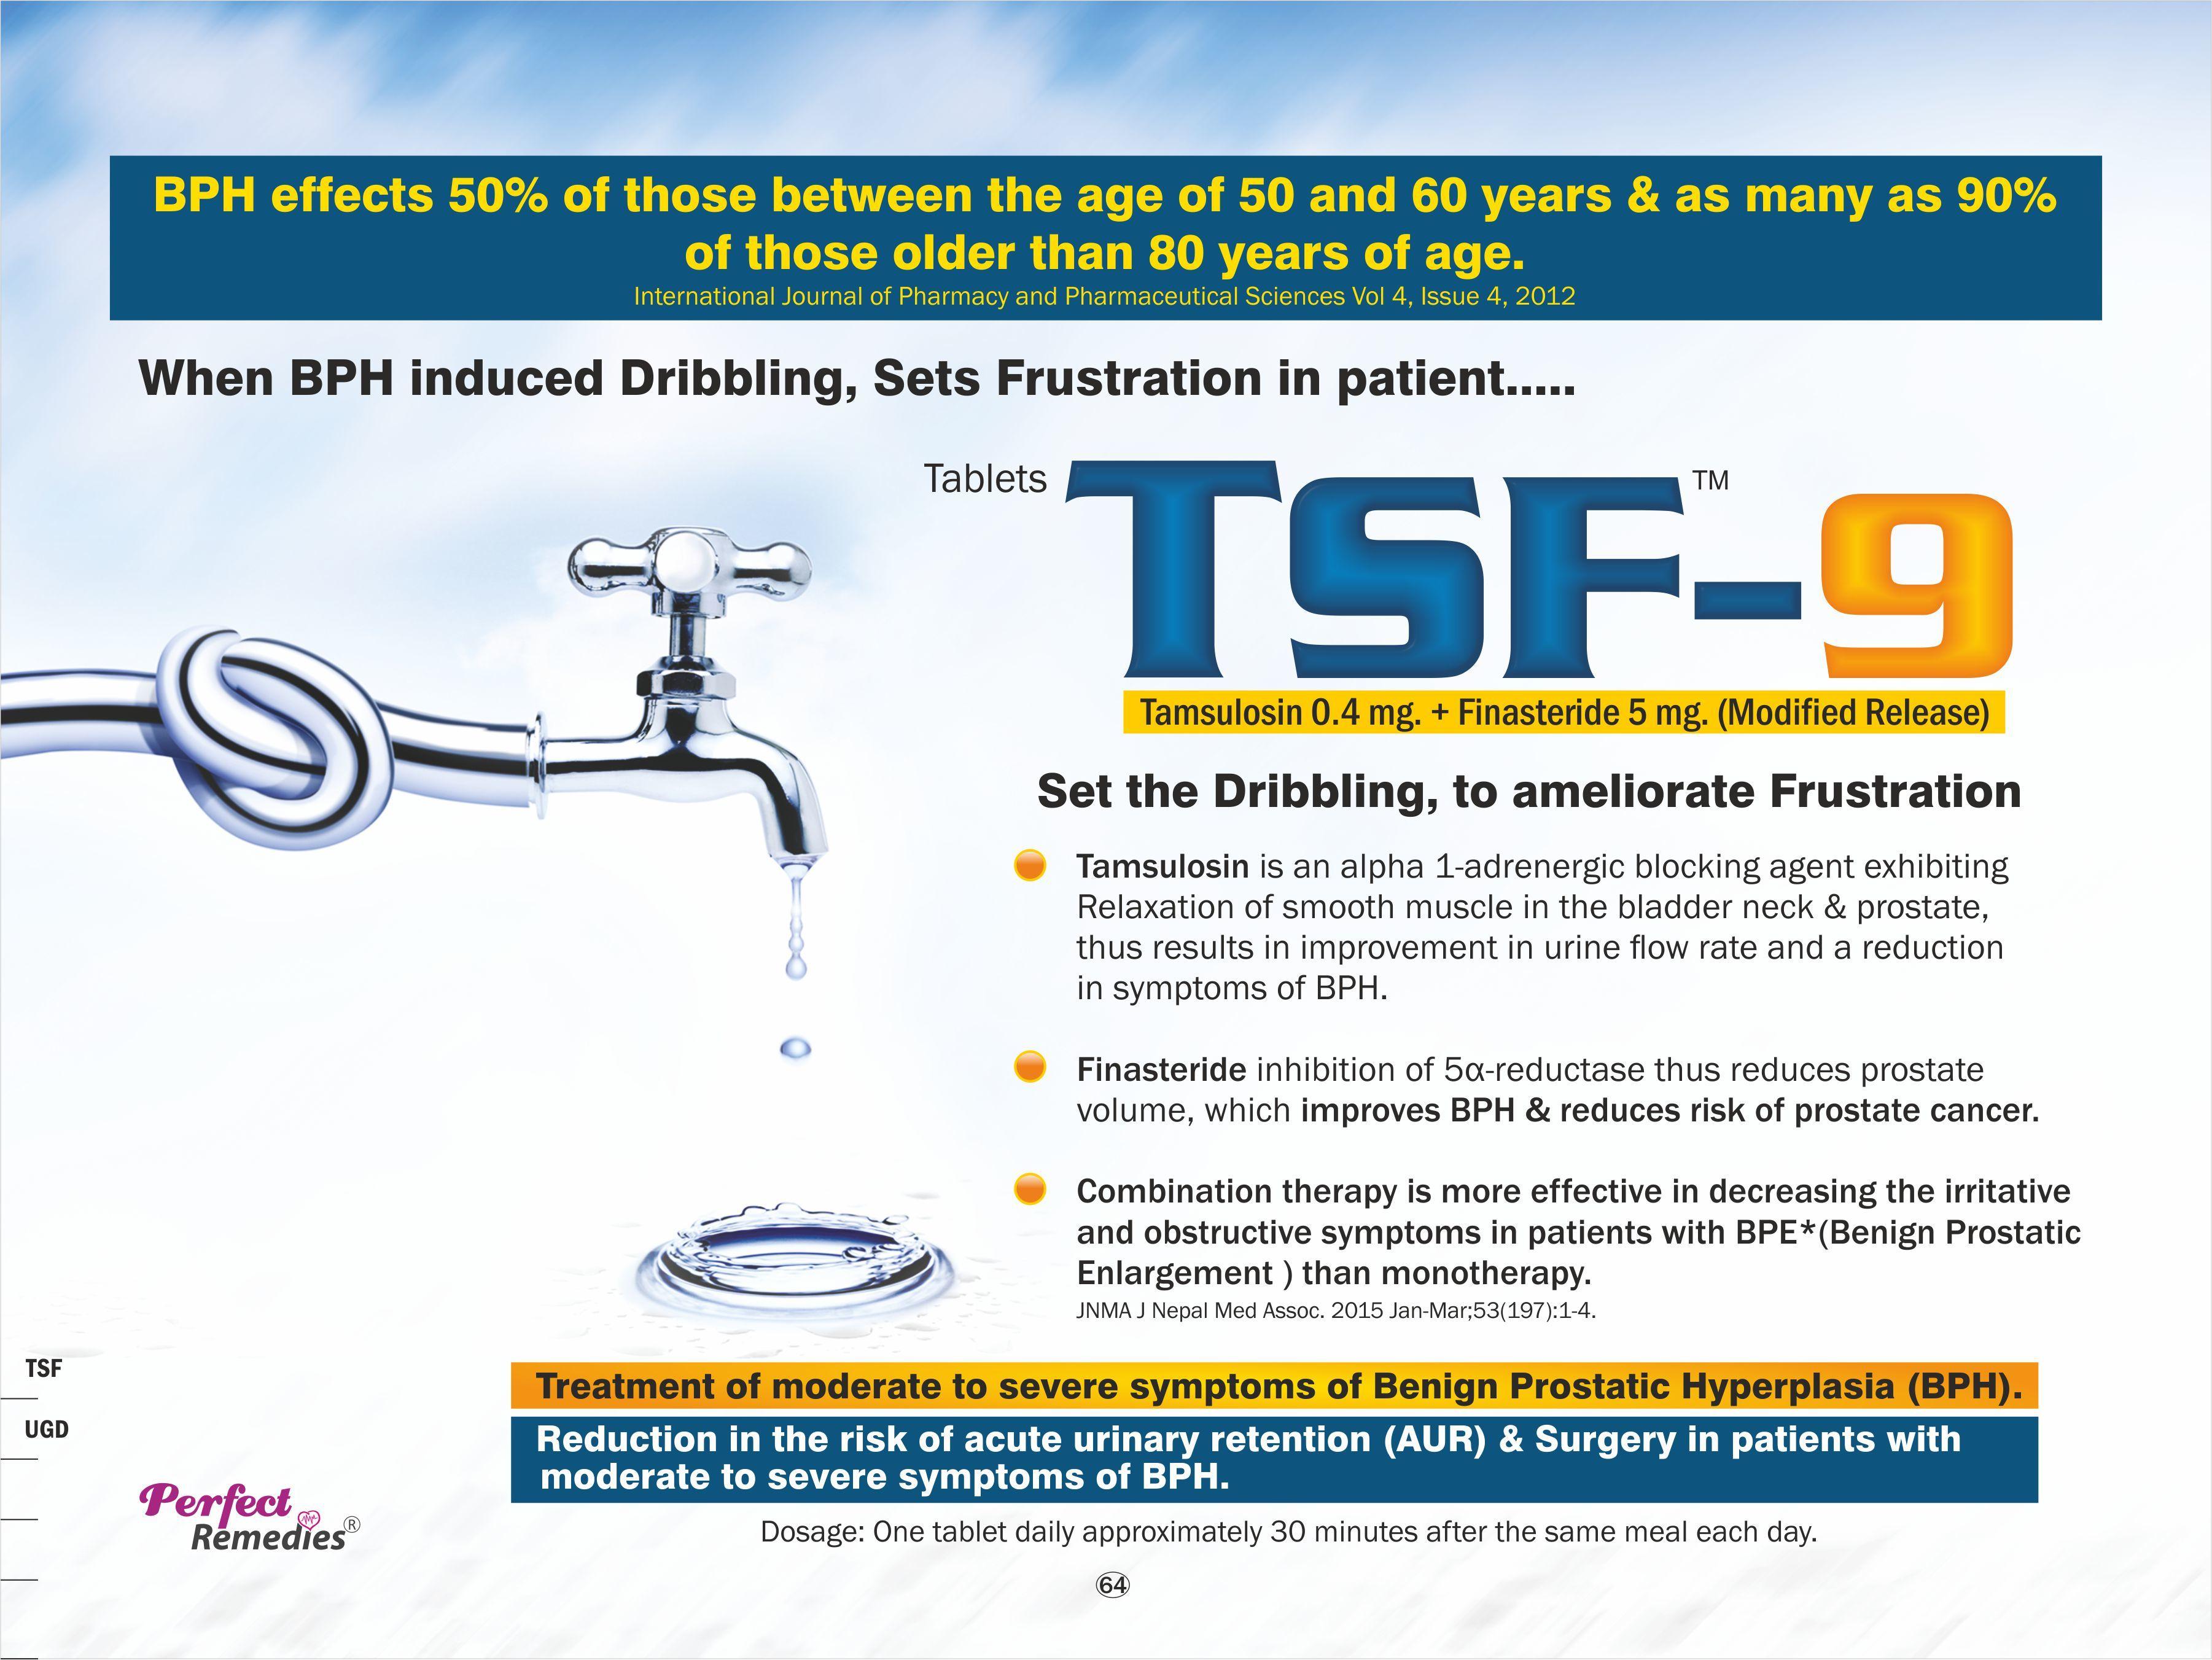 Tamsulosin 0.4 mg with Finasteride 0.5 mg